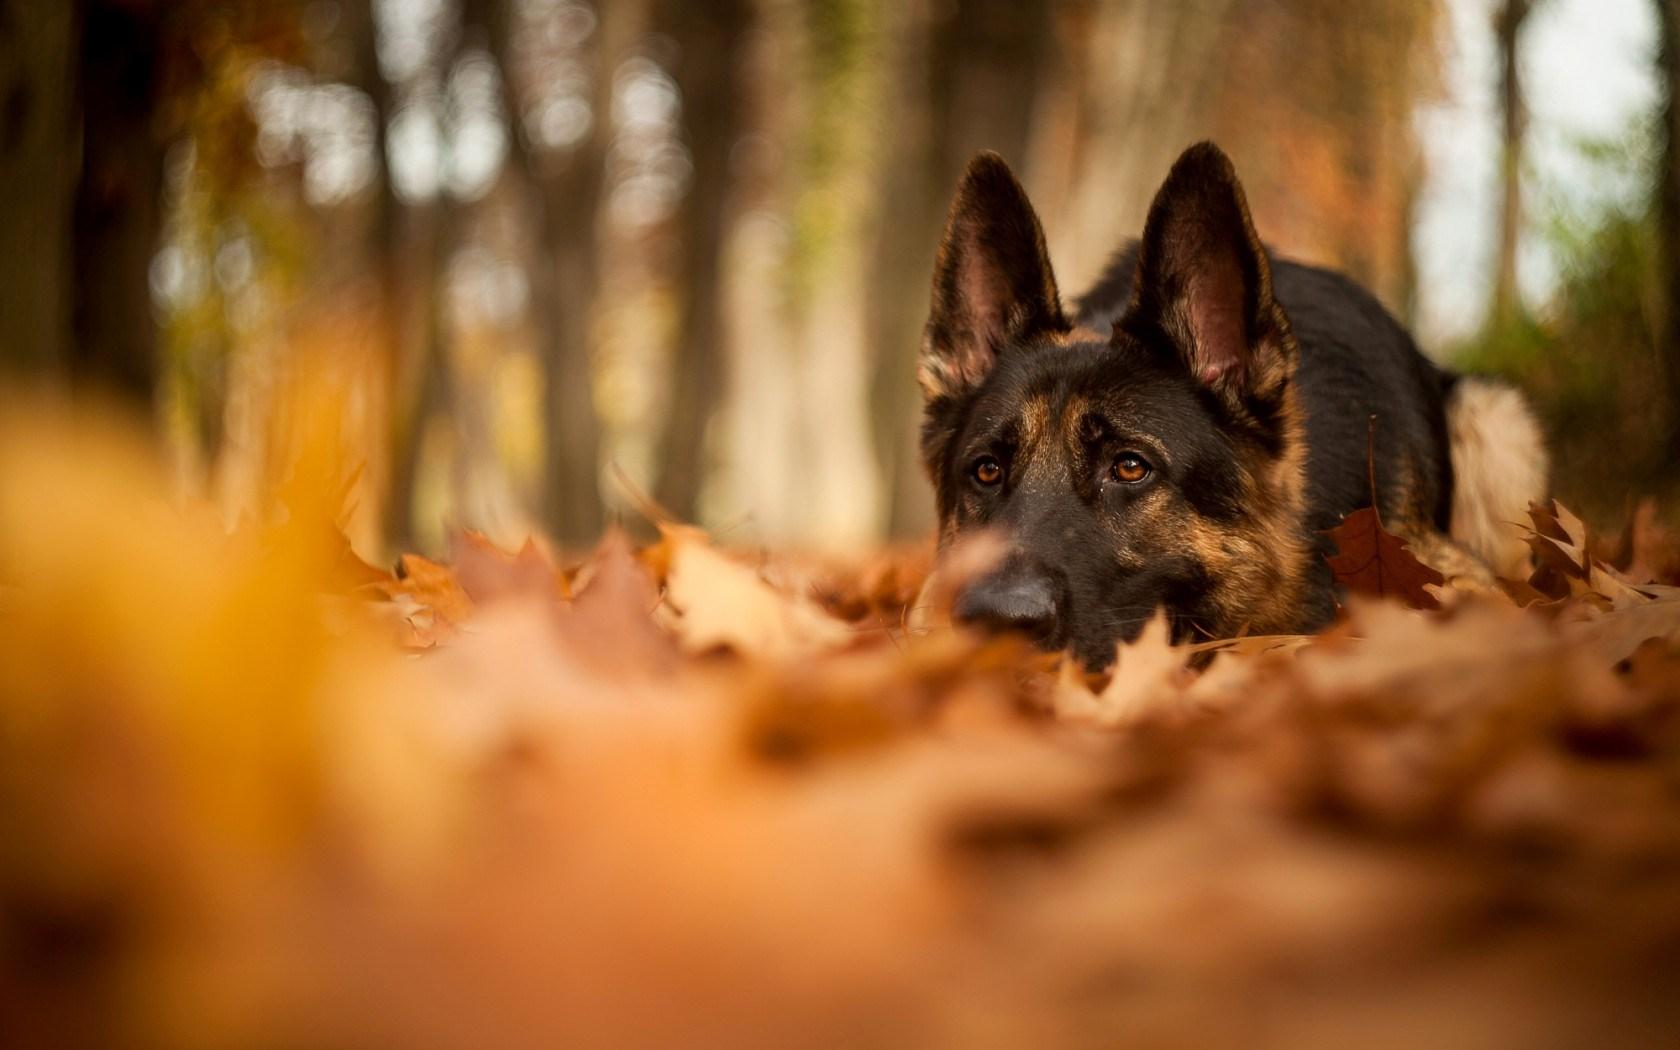 Dogs Autumn Wallpaper   Wallpaper High Definition High Quality 1680x1050